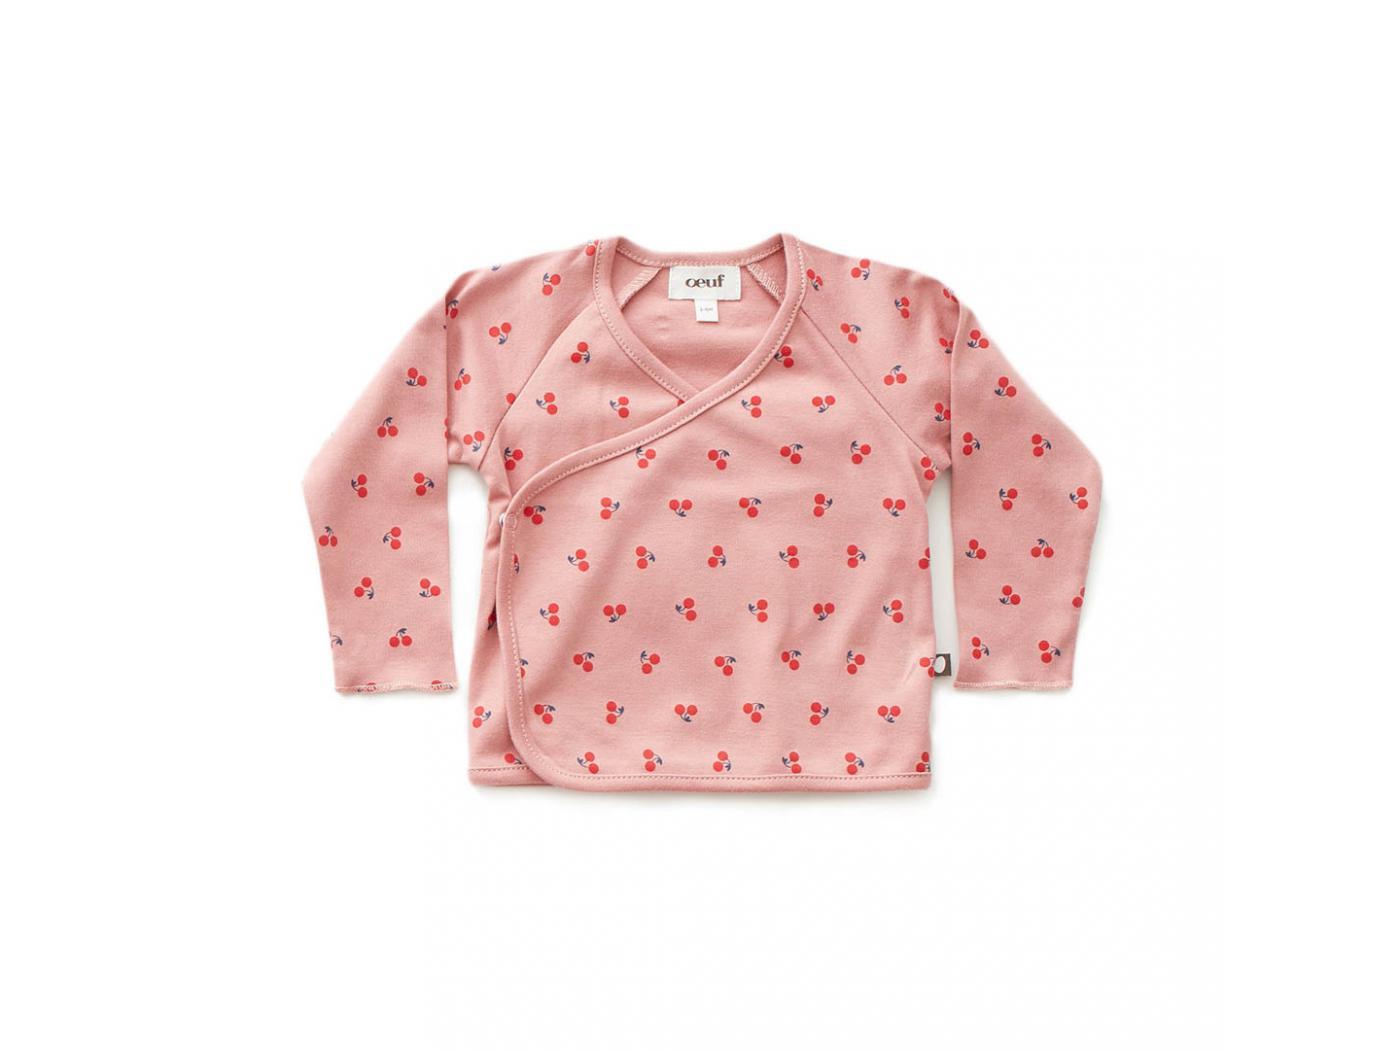 Oeuf Baby Clothes Haut Kimono Cerises Rose En Coton